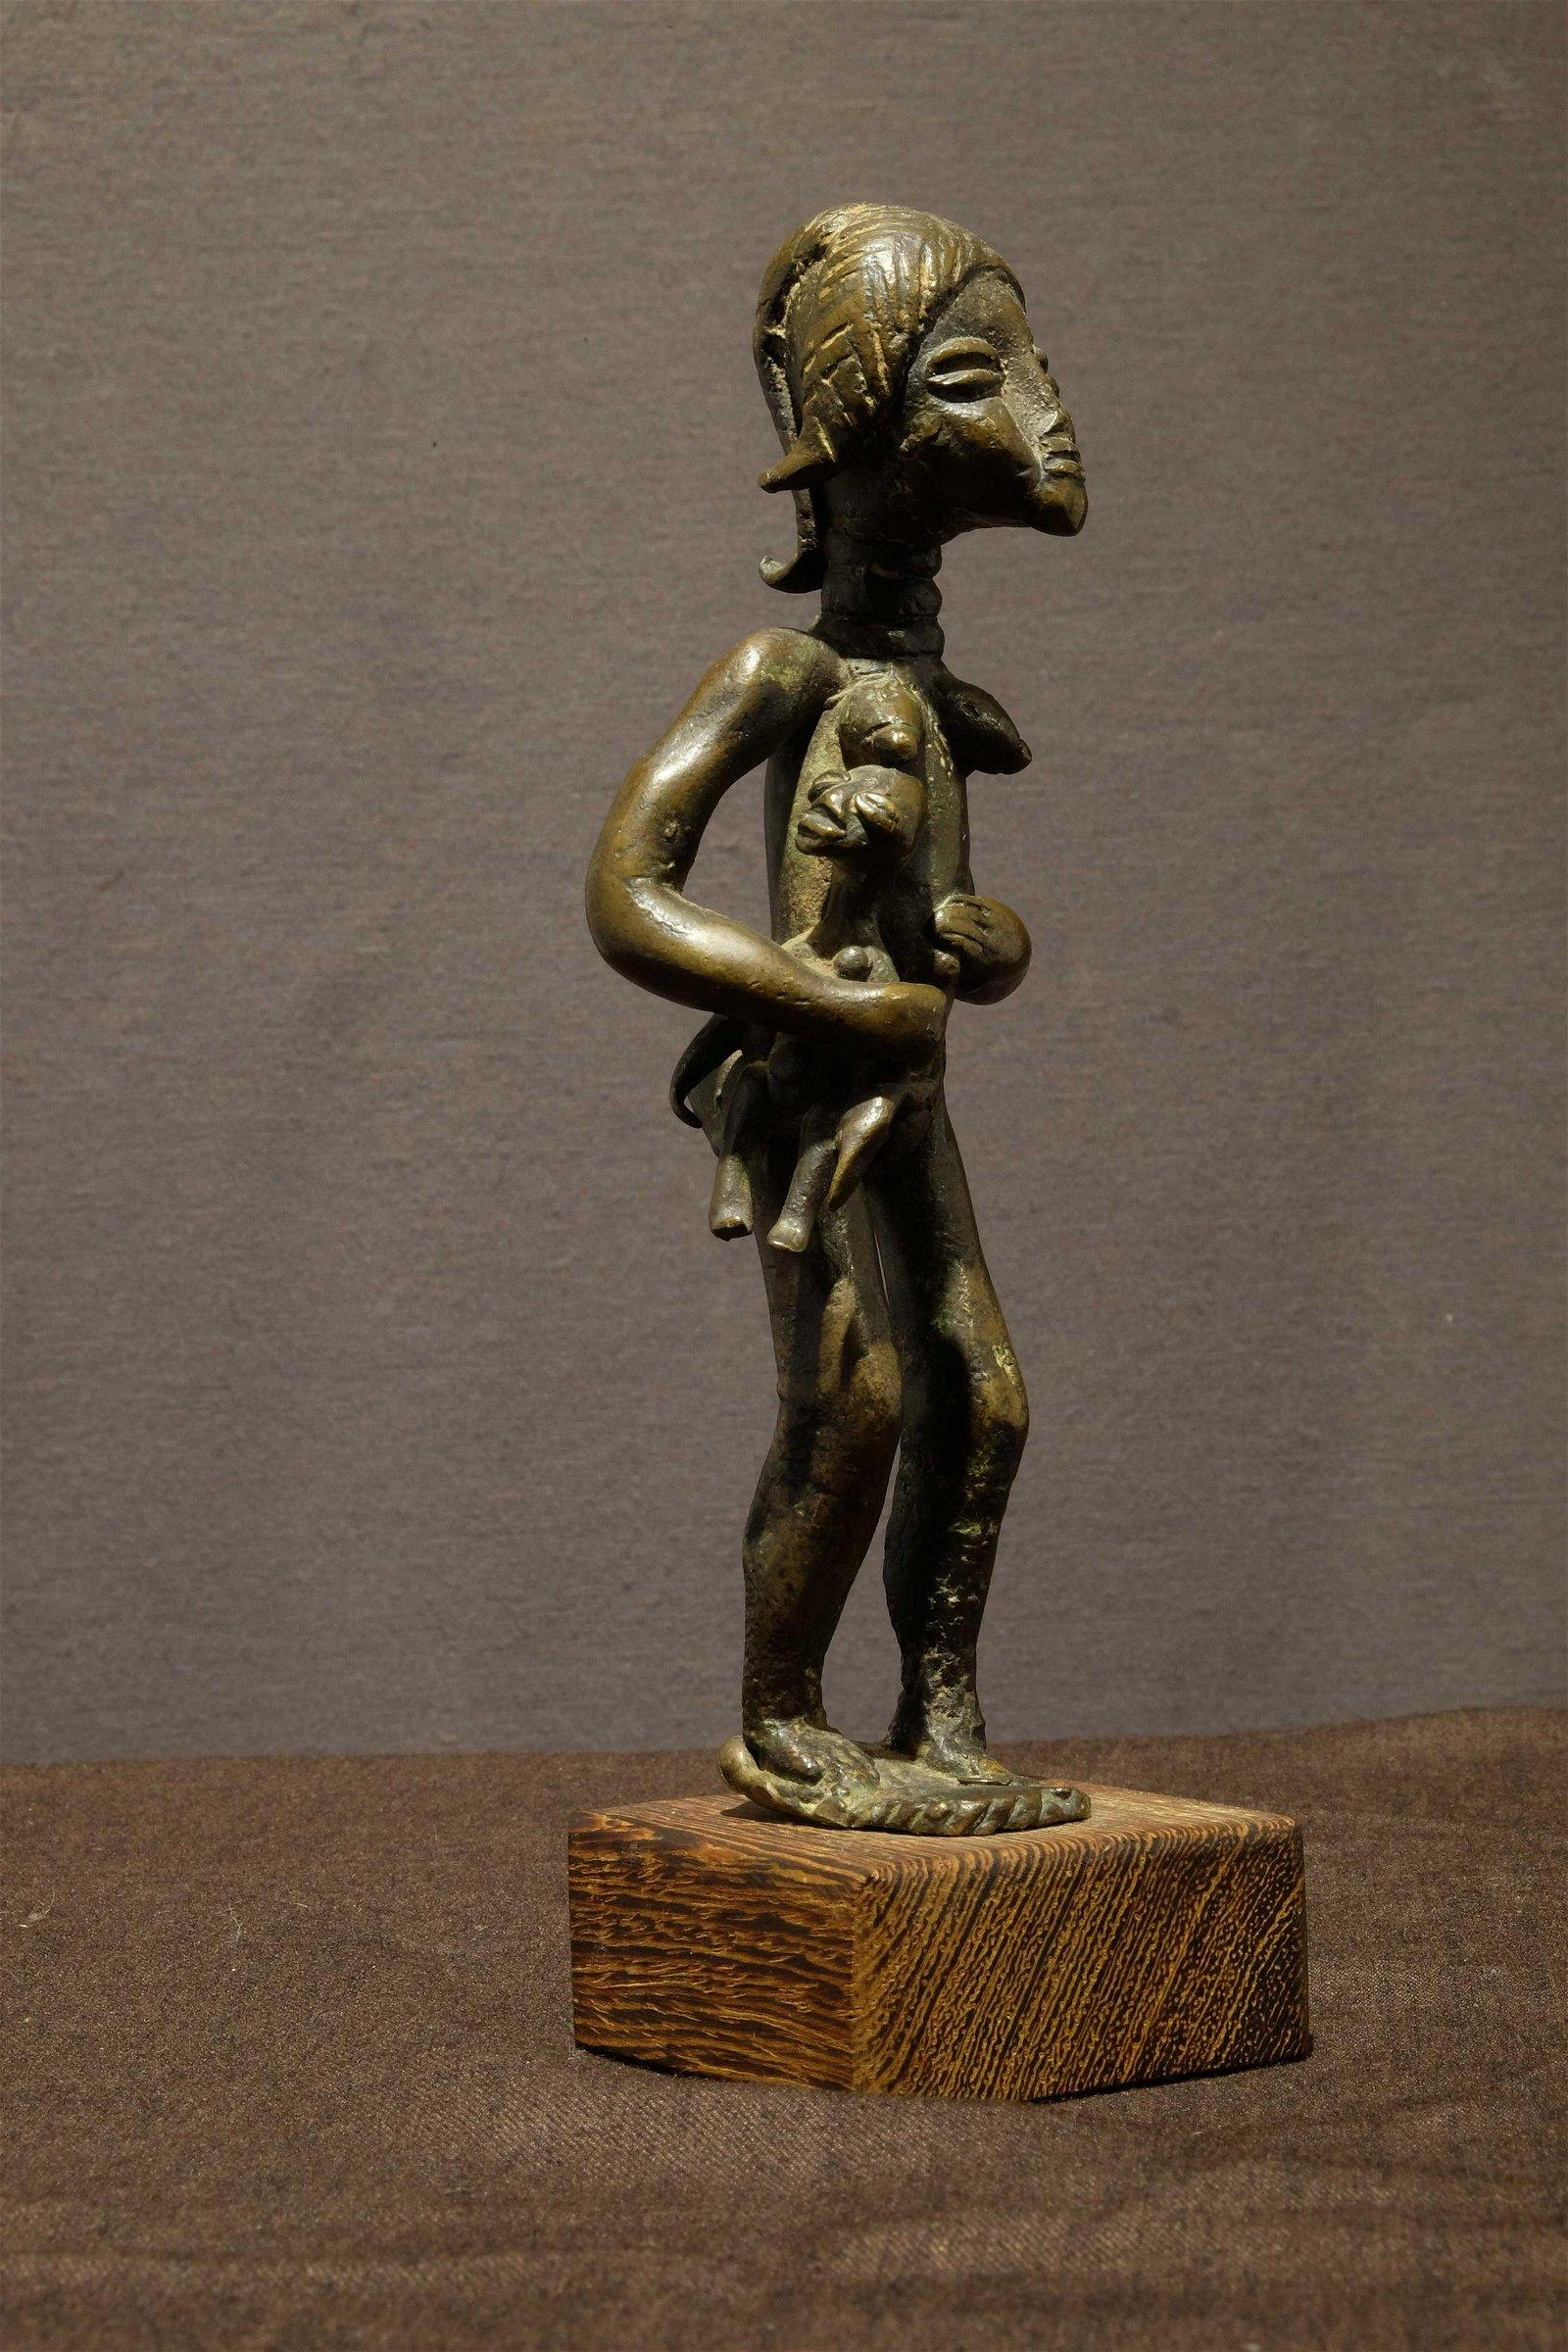 Dan maternity Bronze by artist Ldamie of Gaple